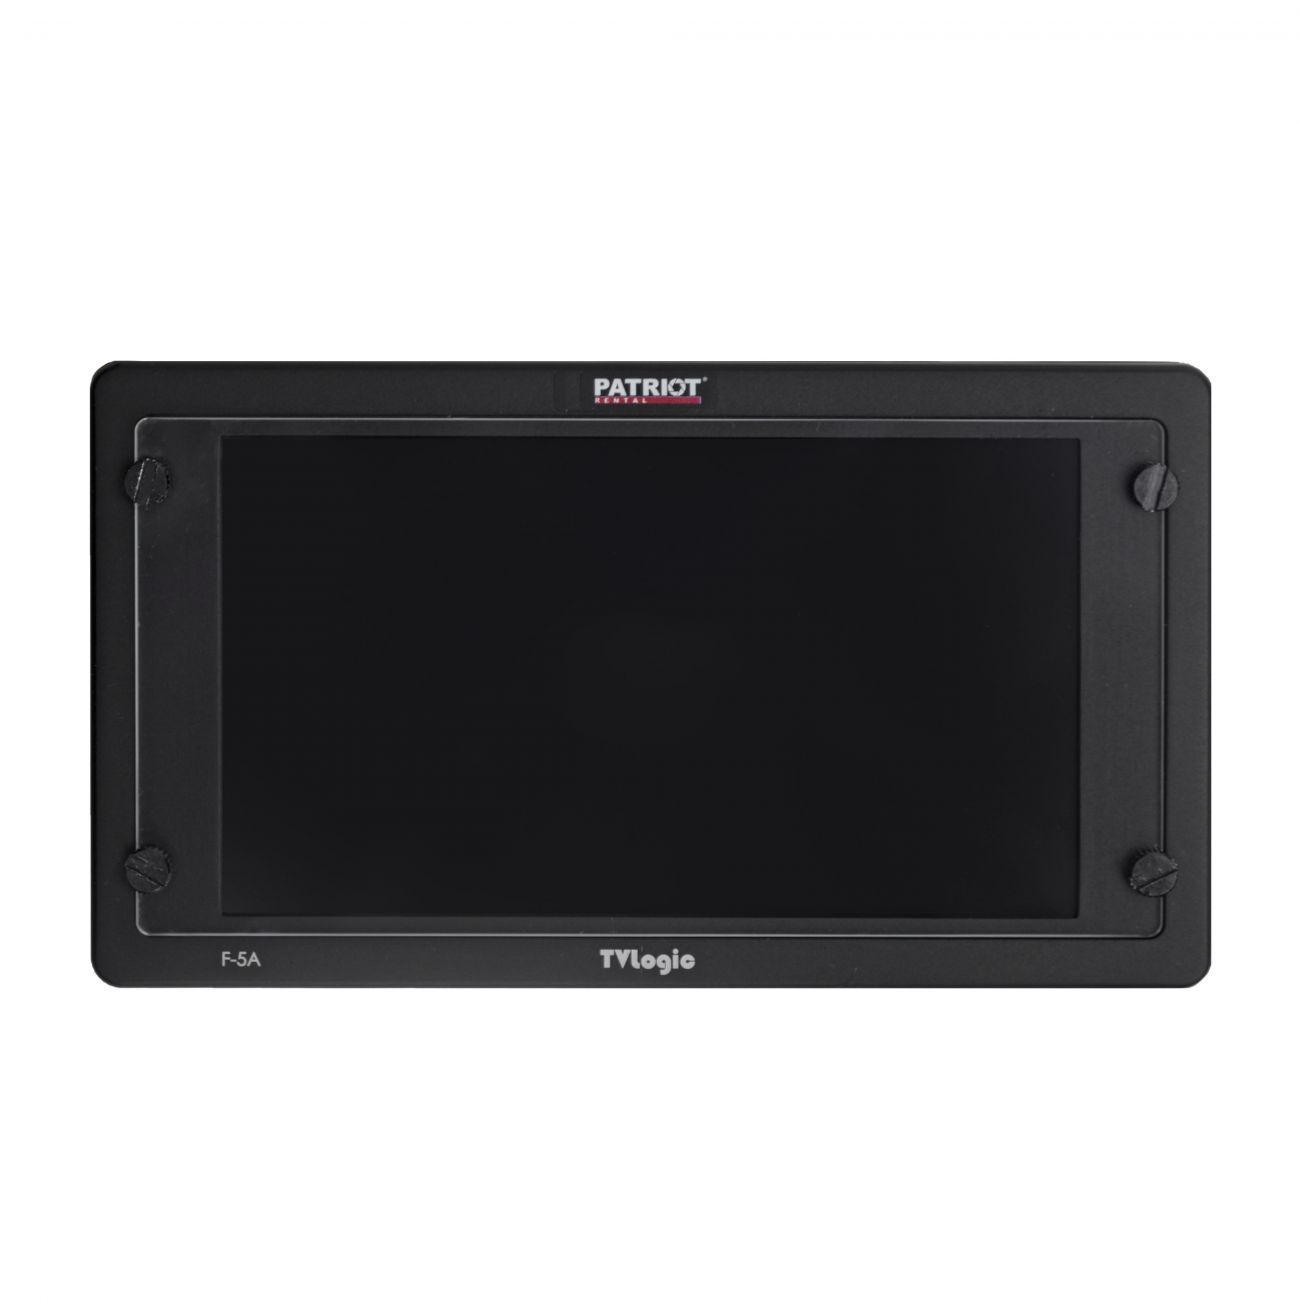 Monitor OnCamera 5.5″ TV Logic F-5A-AG + battery